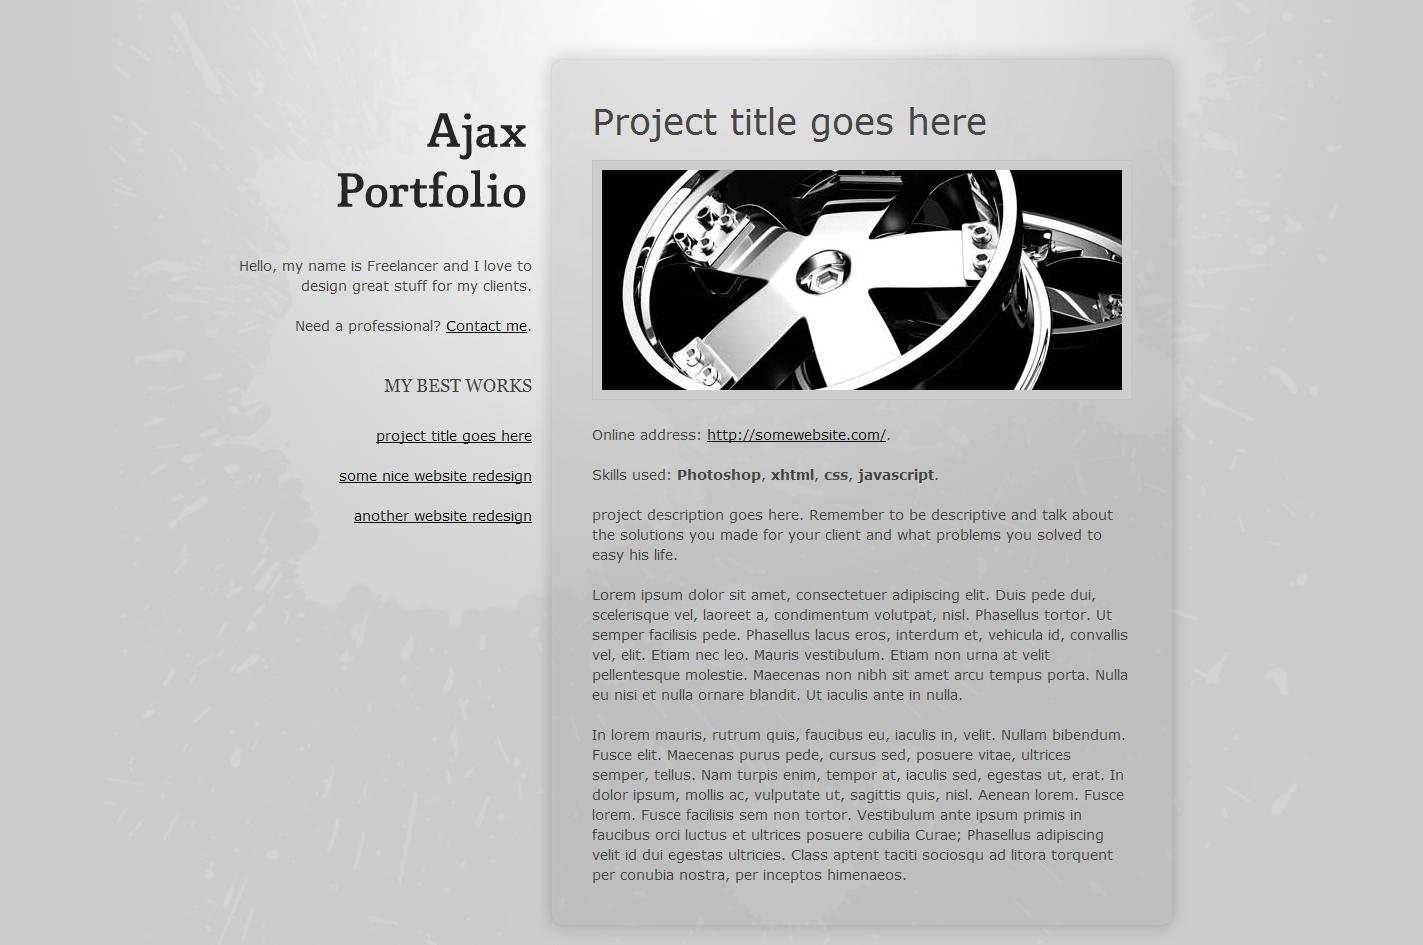 Free Download Ajax Portfolio Nulled Latest Version